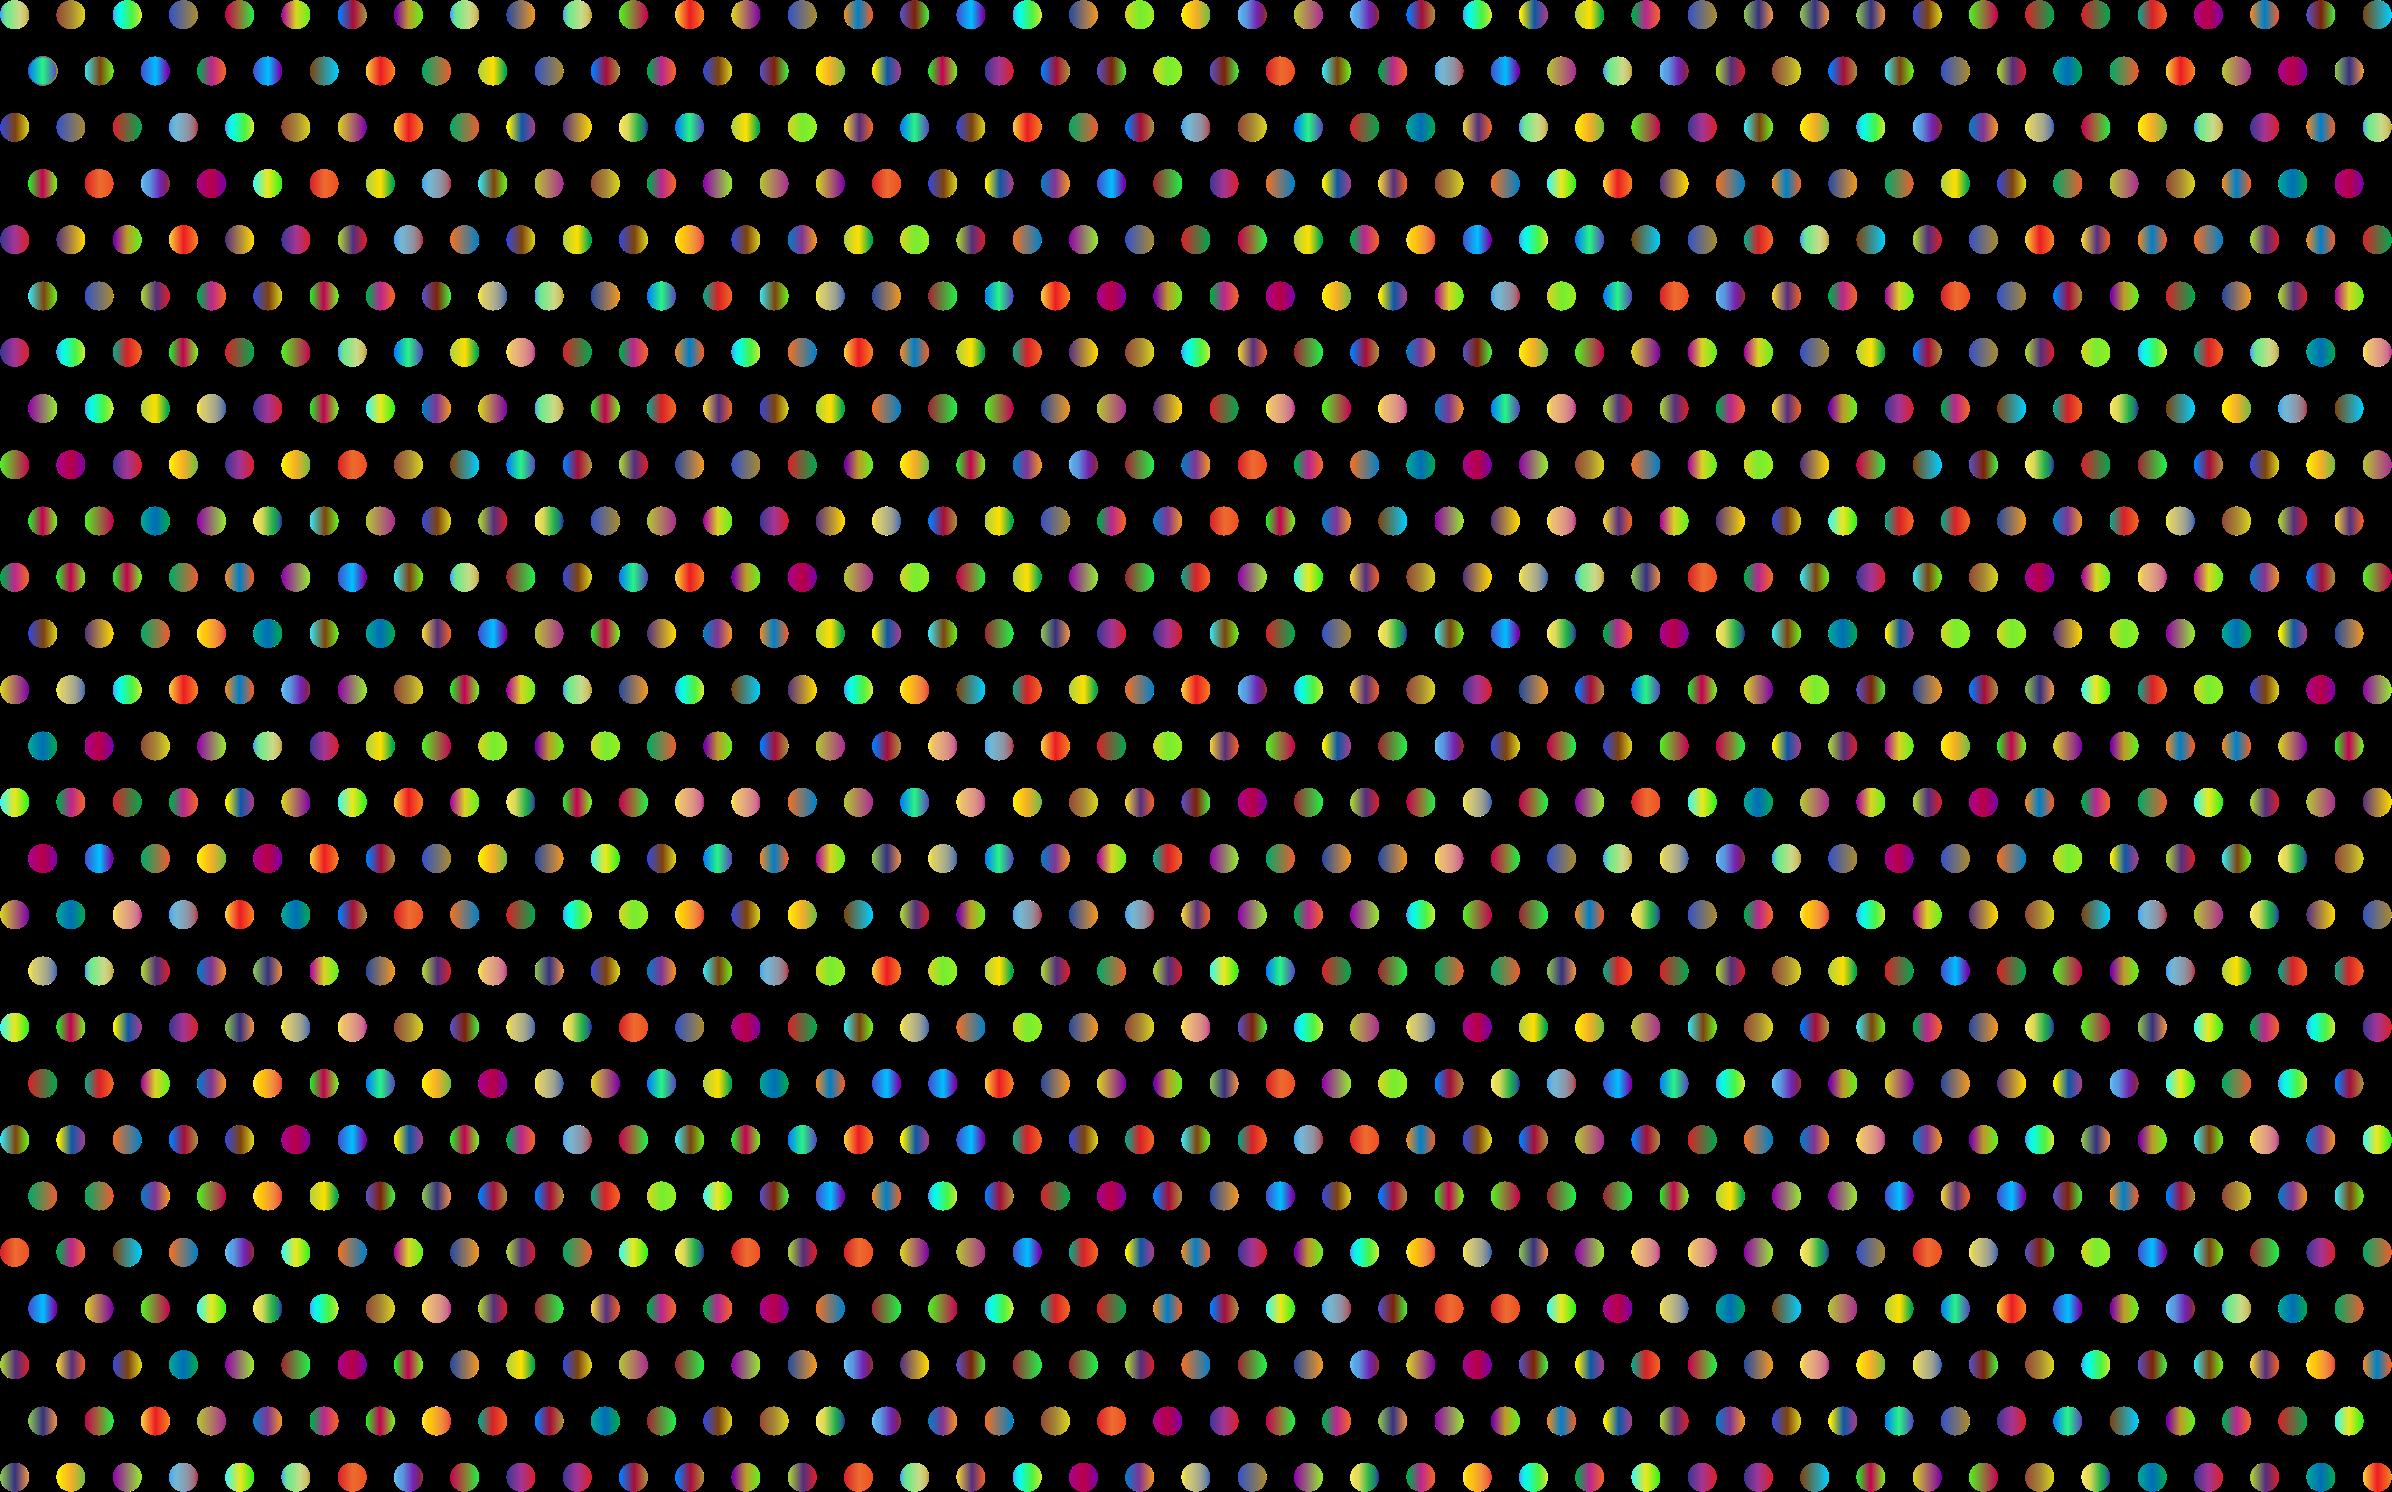 3 clipart polka dot. Prismatic dots mark ii